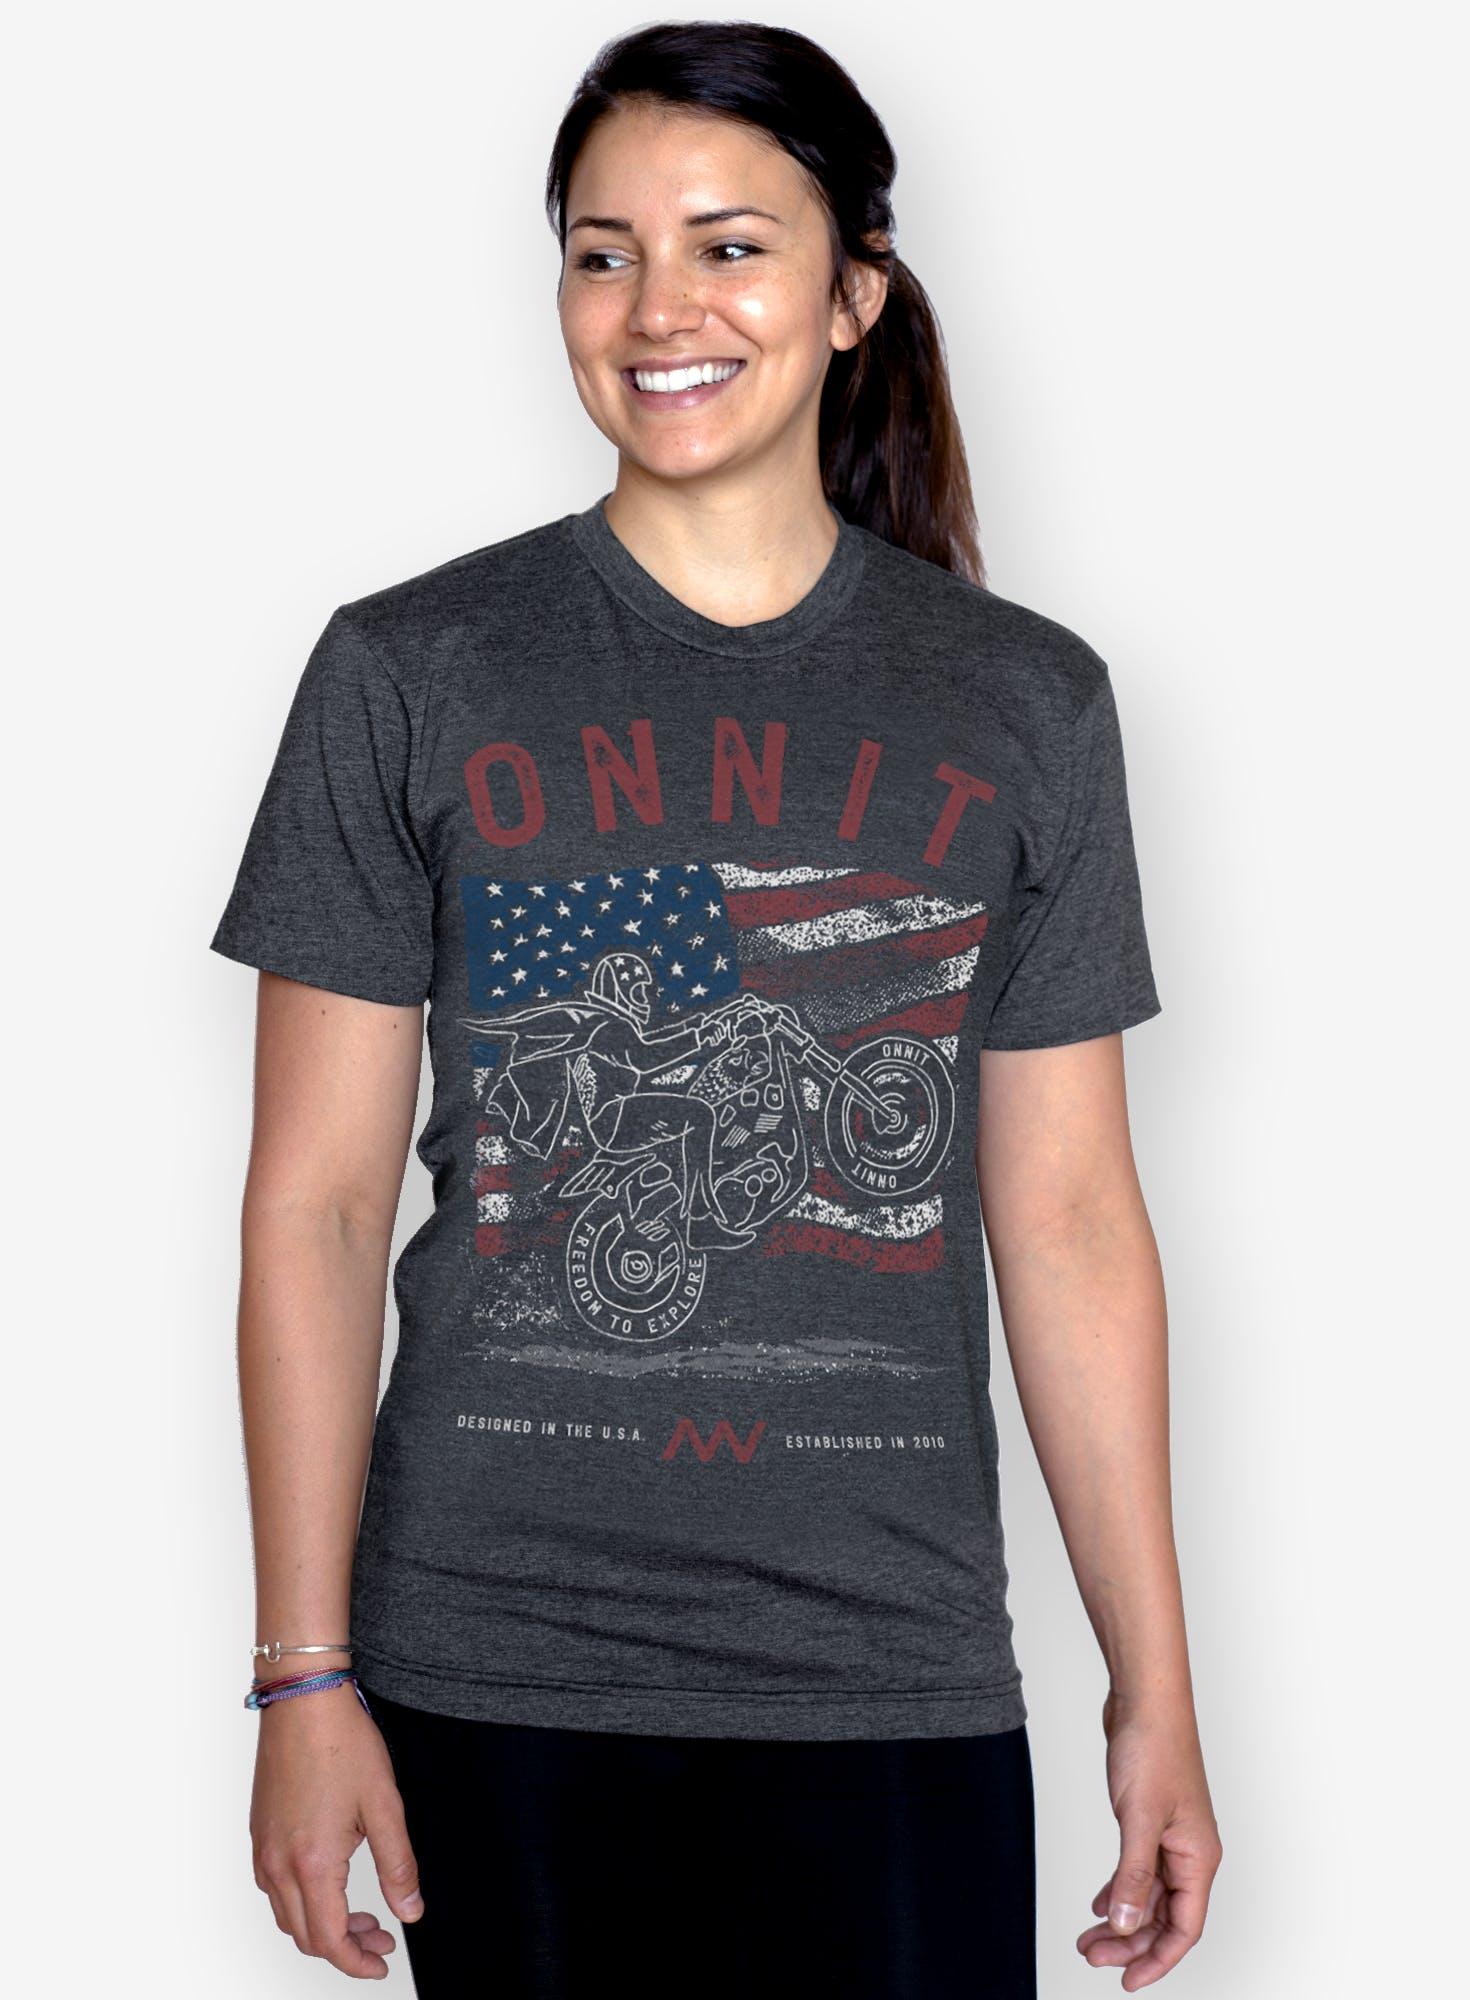 Go 4th and Explore T-Shirt Bonus Image